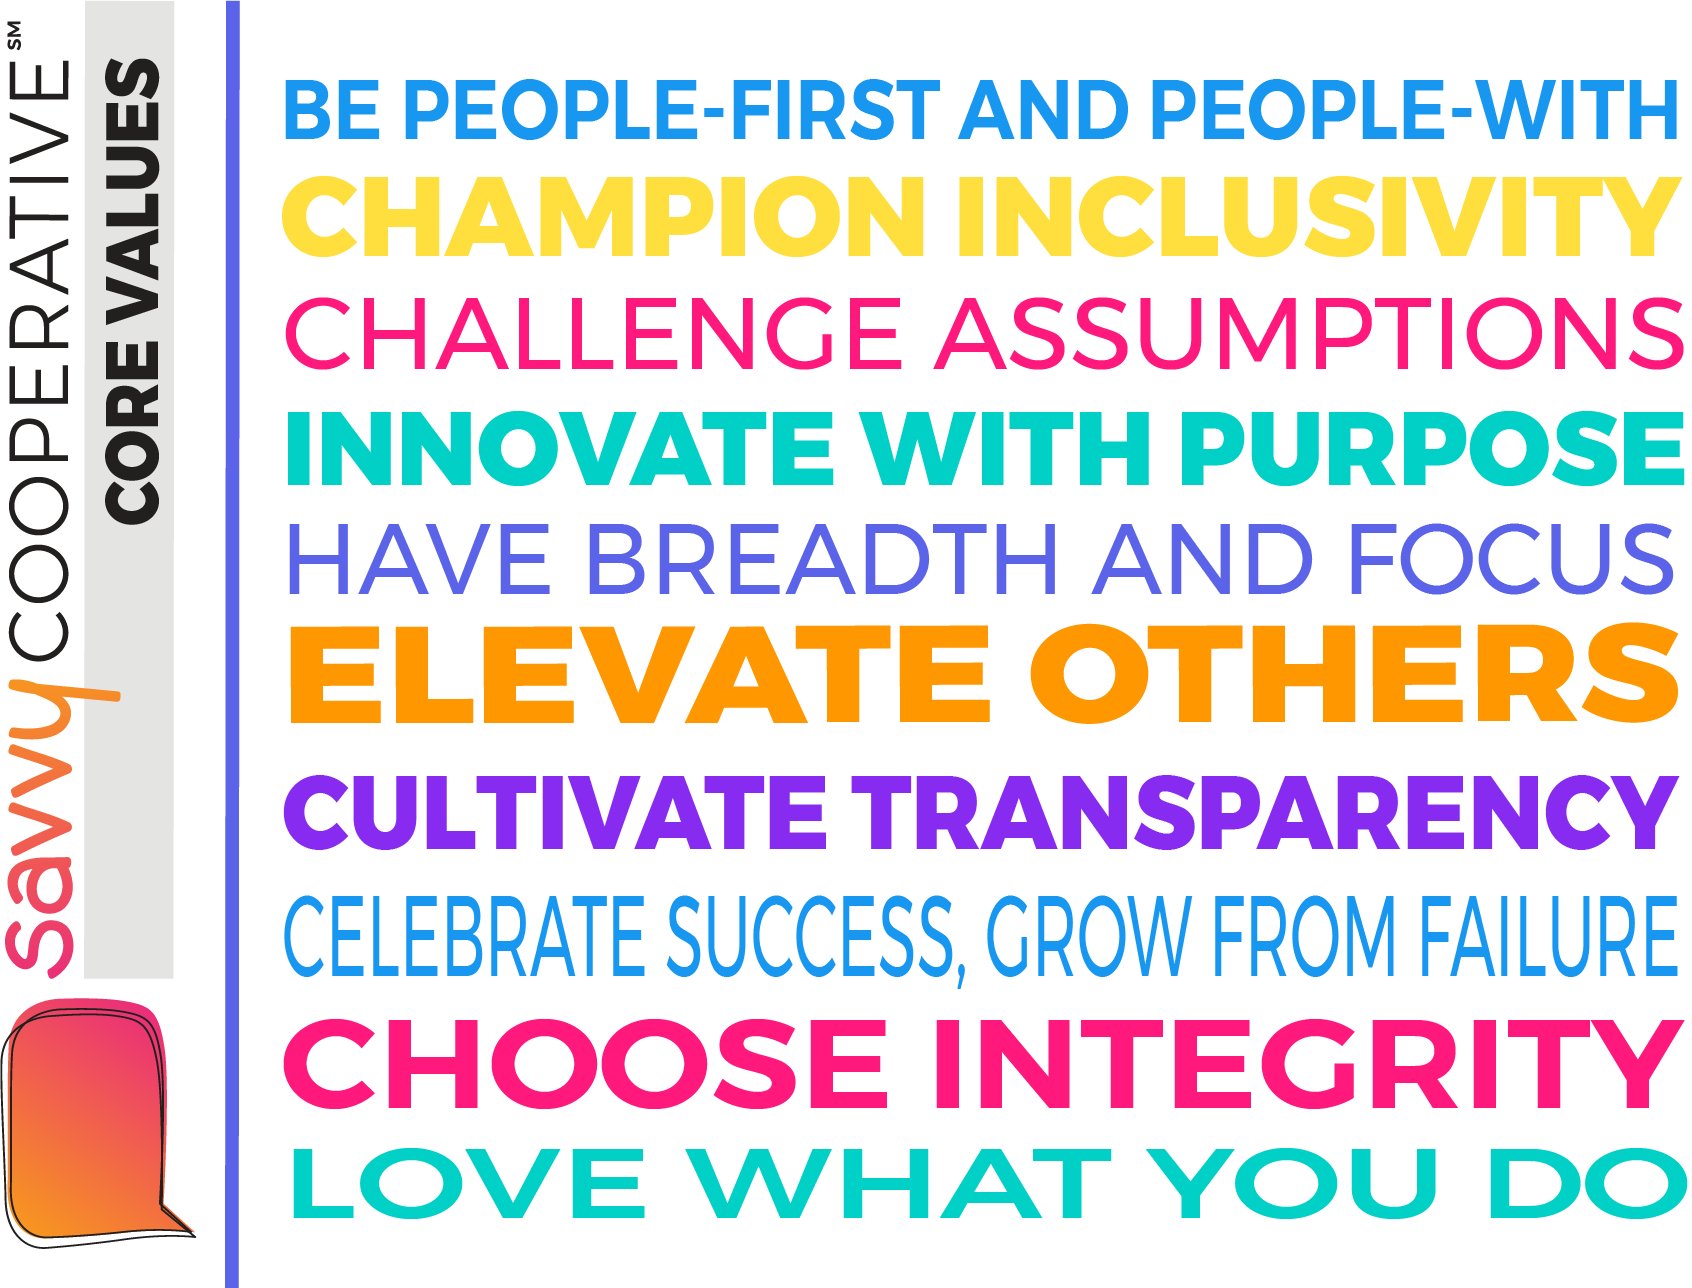 Our_Core_Values